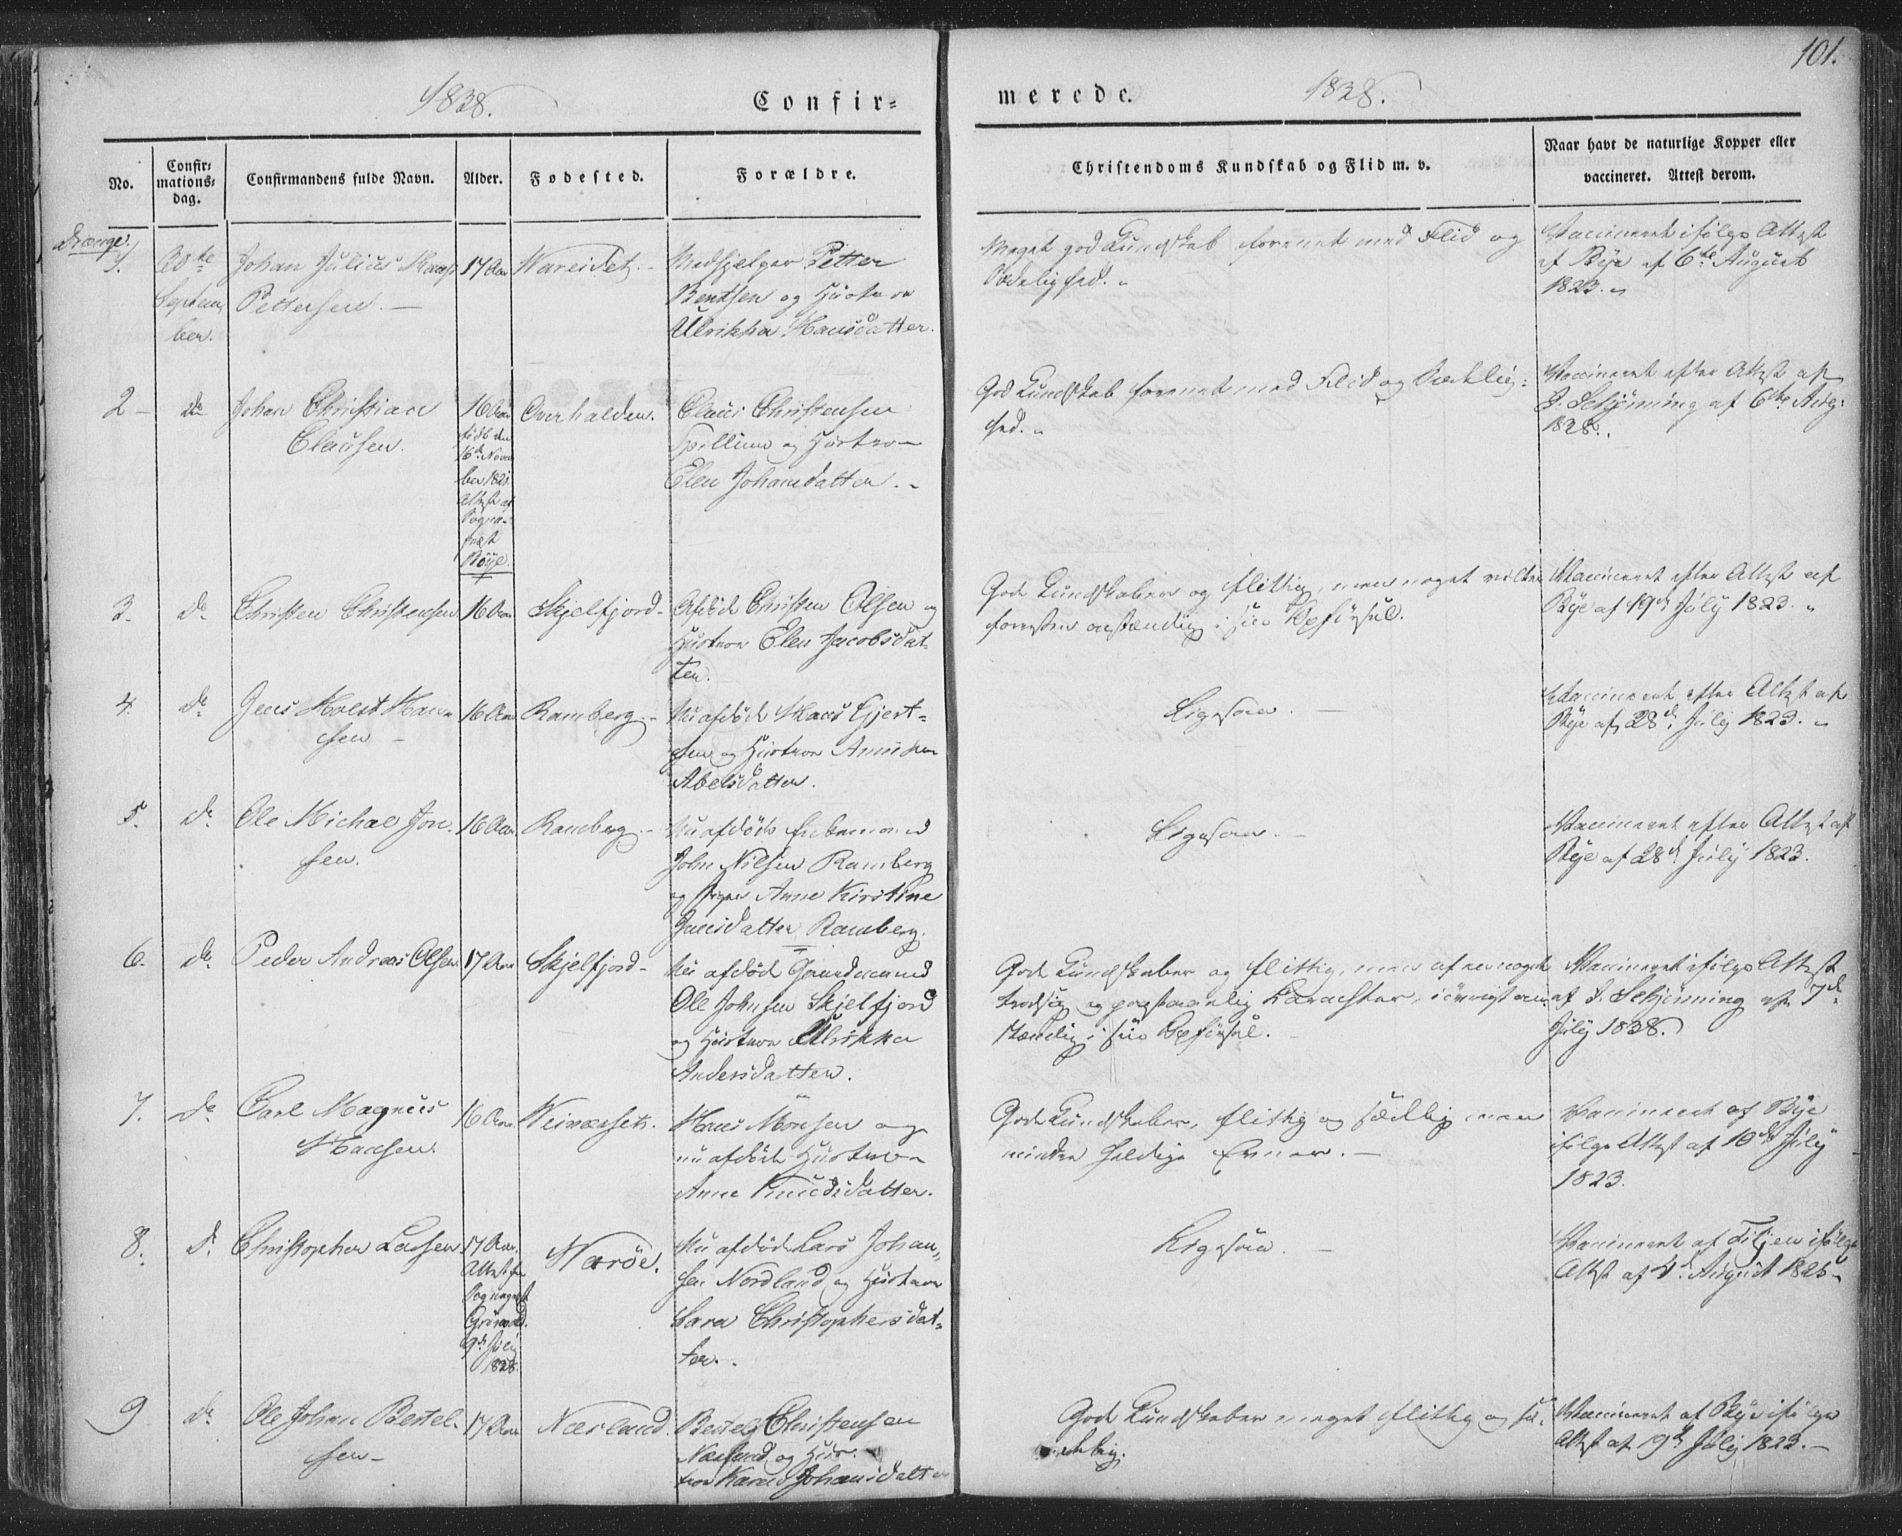 SAT, Ministerialprotokoller, klokkerbøker og fødselsregistre - Nordland, 885/L1202: Ministerialbok nr. 885A03, 1838-1859, s. 101